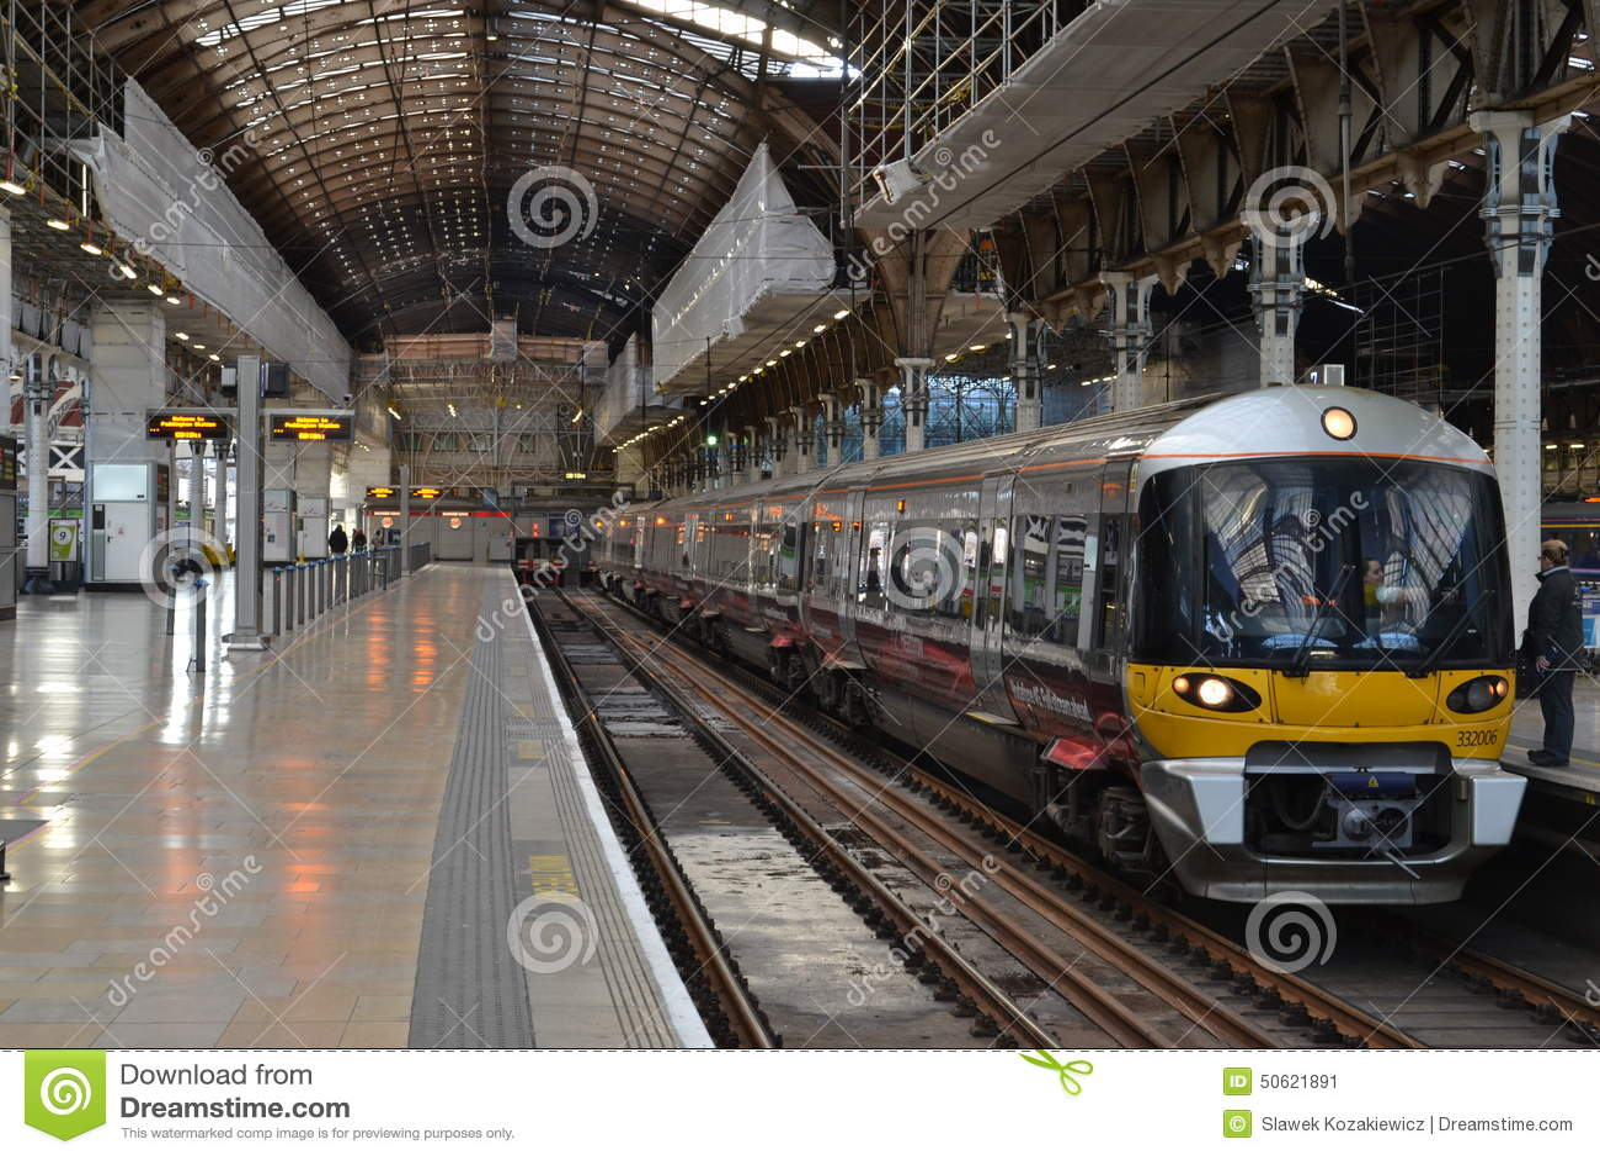 London Paddington Train Station Editorial Photo Image of platform